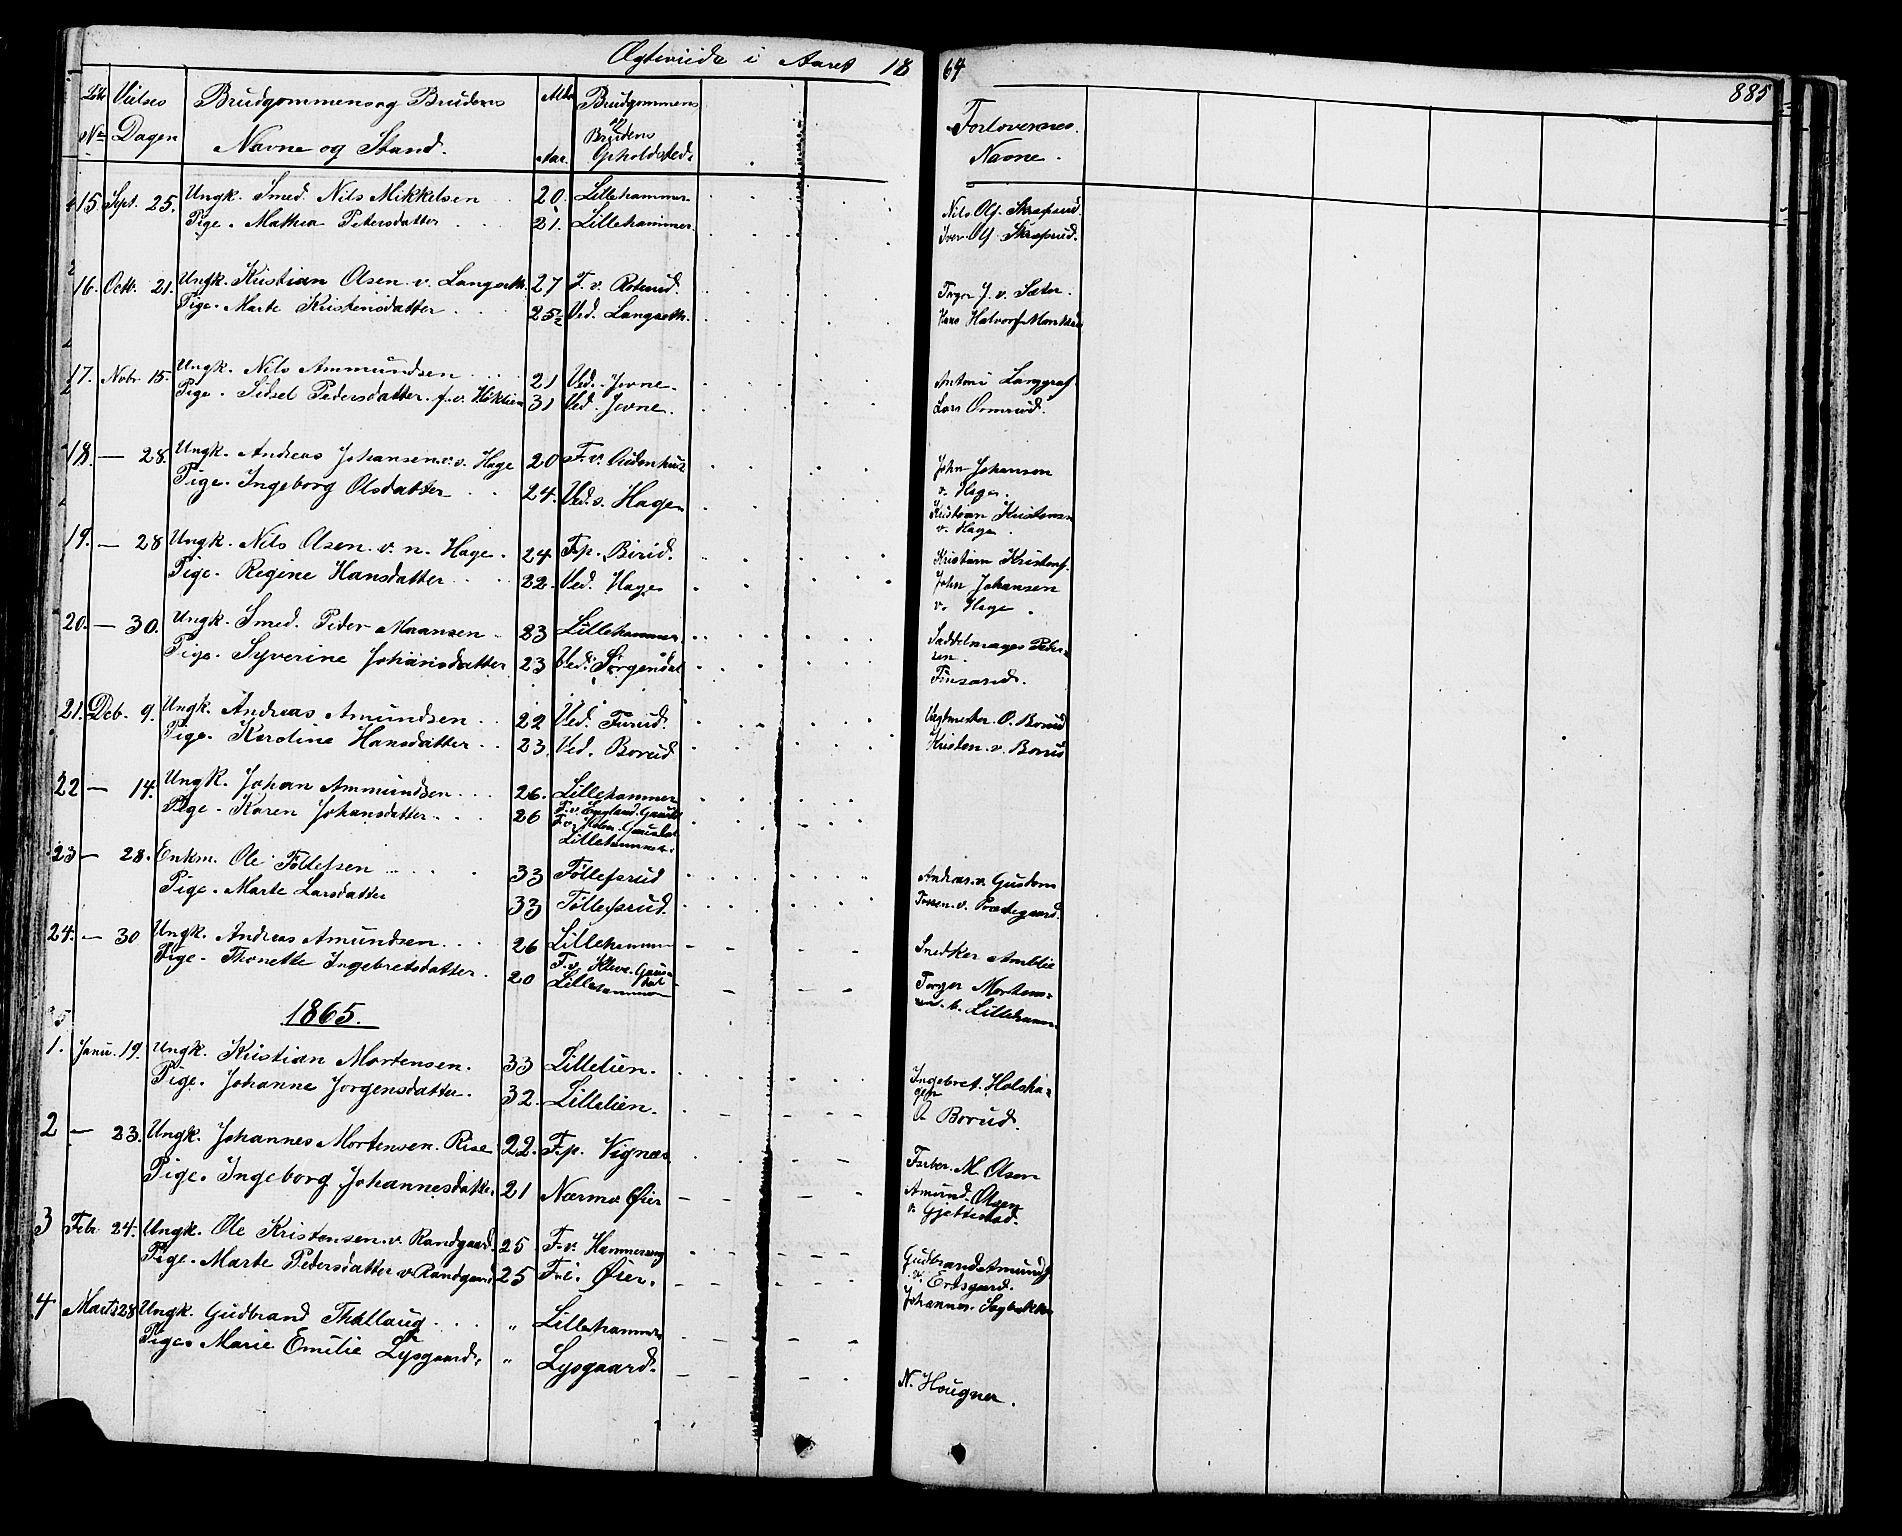 SAH, Fåberg prestekontor, Klokkerbok nr. 7, 1856-1891, s. 884-885